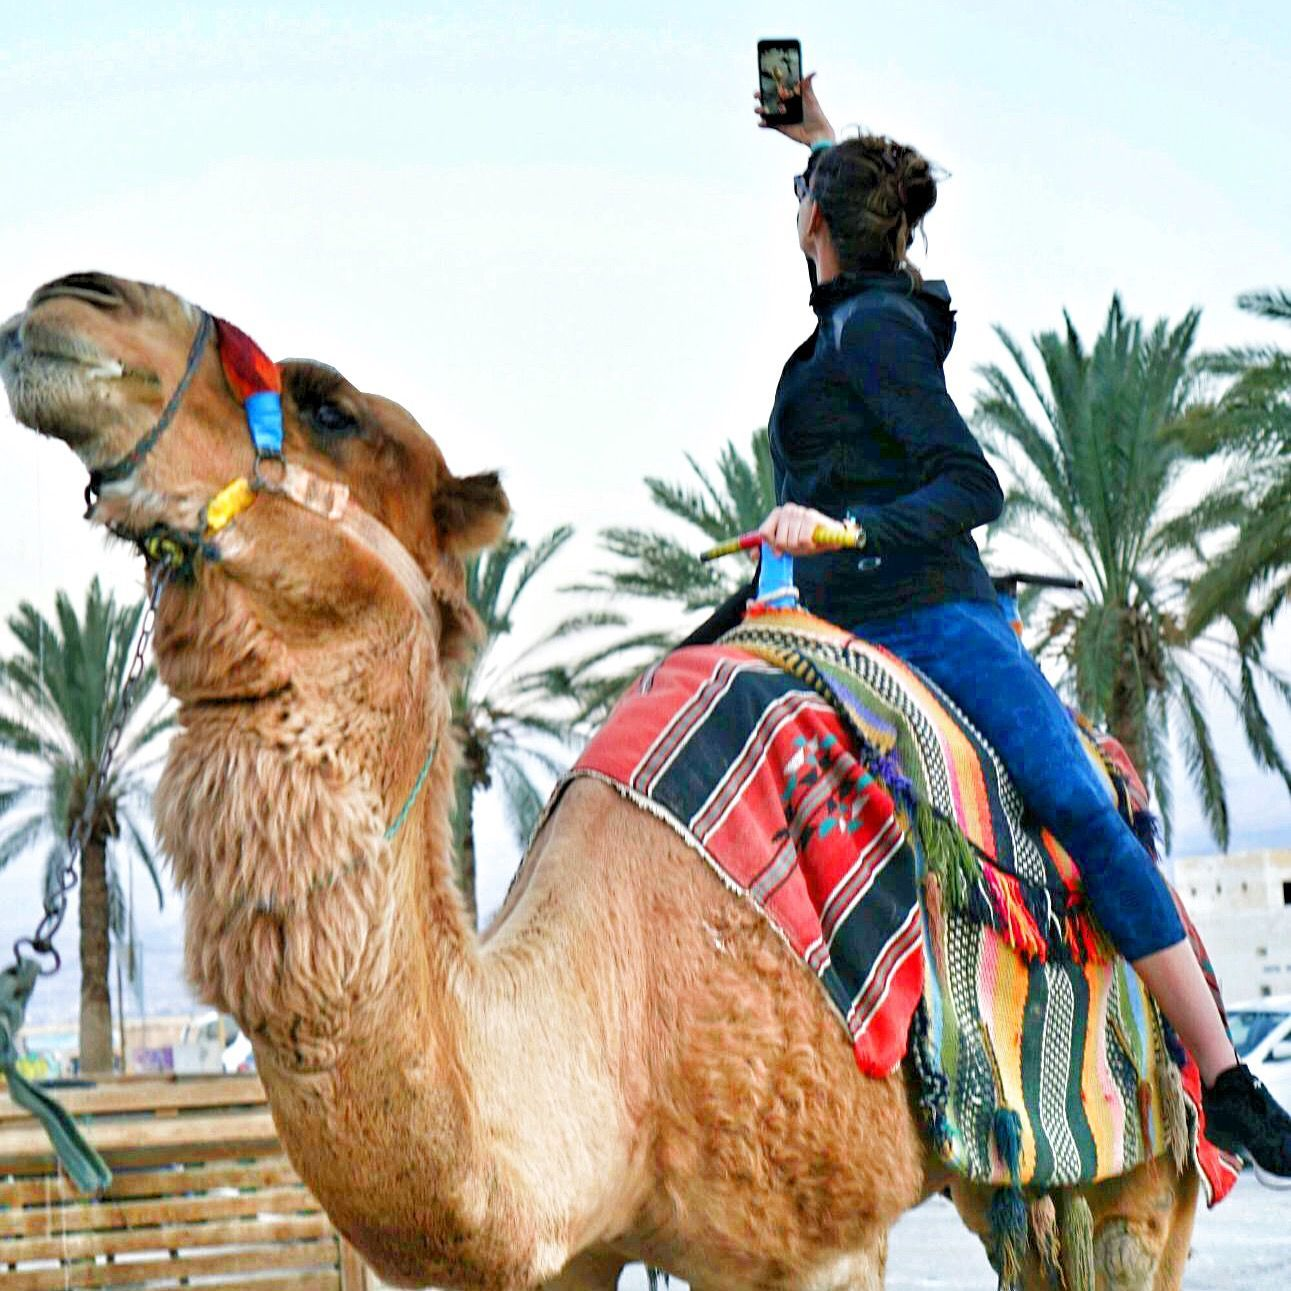 Destination: Israman. Eilat, Israel — Athlete Food #athletefood Destination: Israman. Eilat, Israel #athletefood